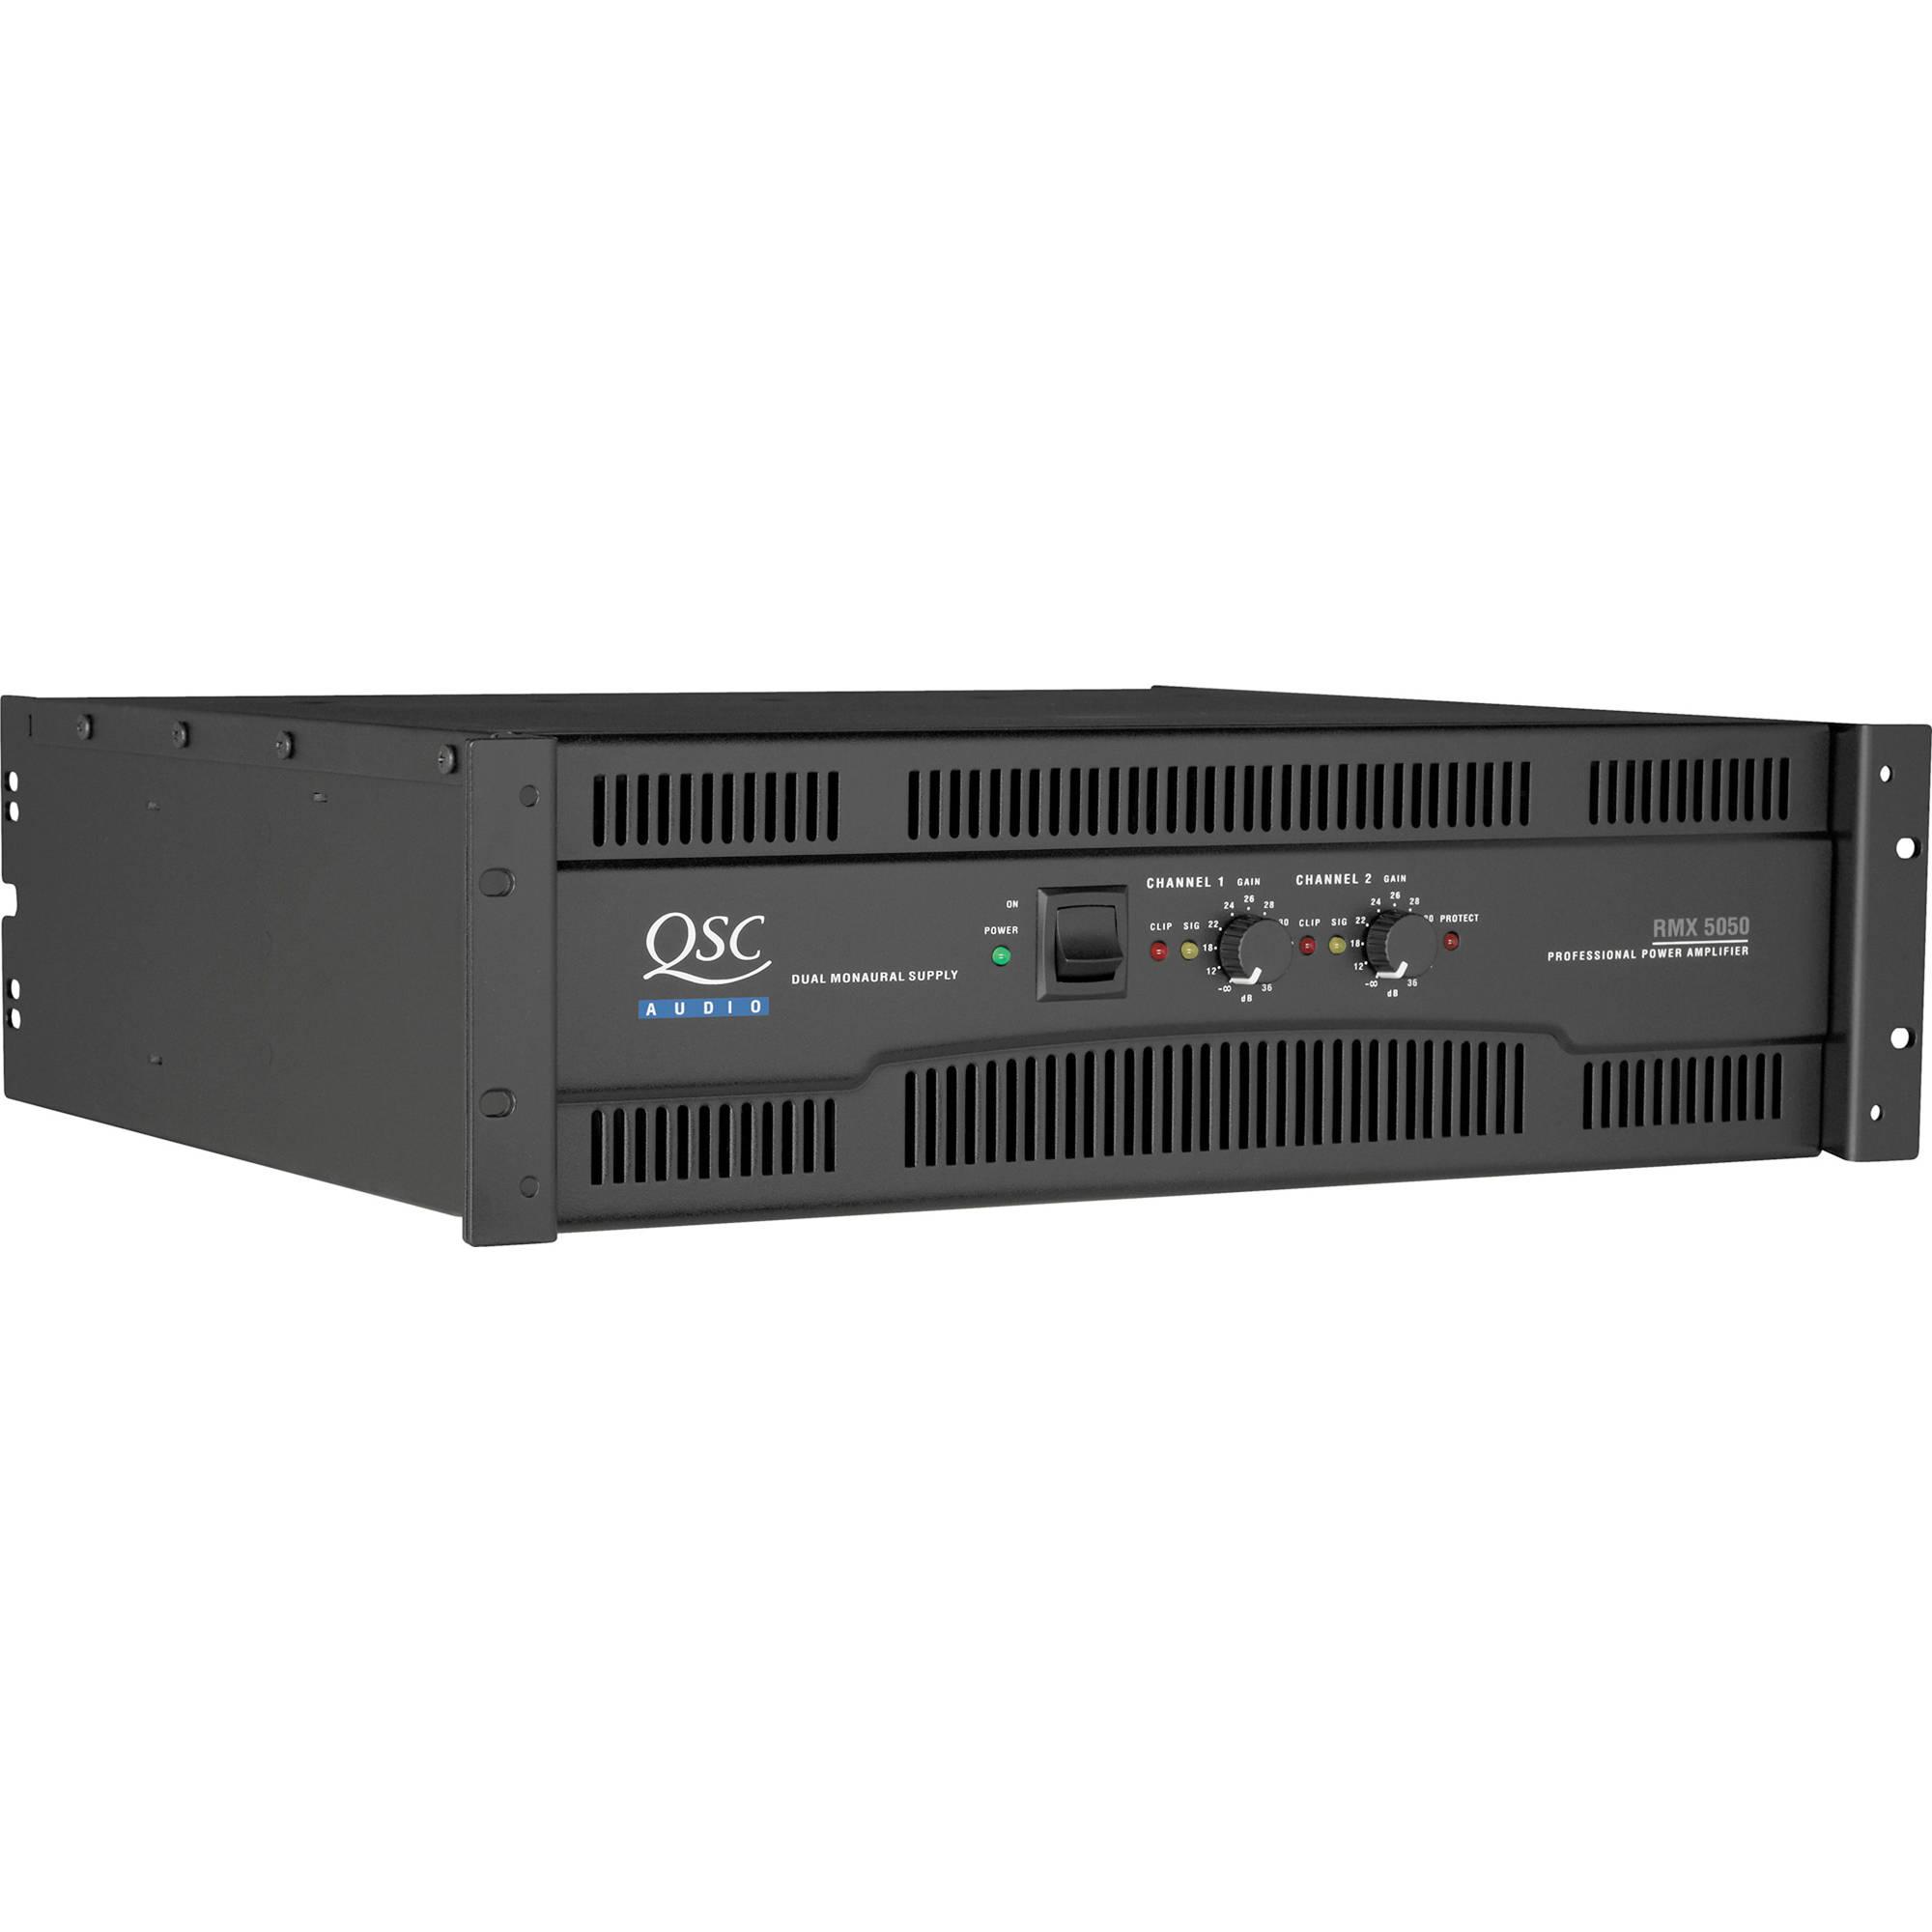 Power Amplifier Qsc 5050 : qsc rmx 5050 2 channel power amplifier rmx5050 b h photo video ~ Vivirlamusica.com Haus und Dekorationen